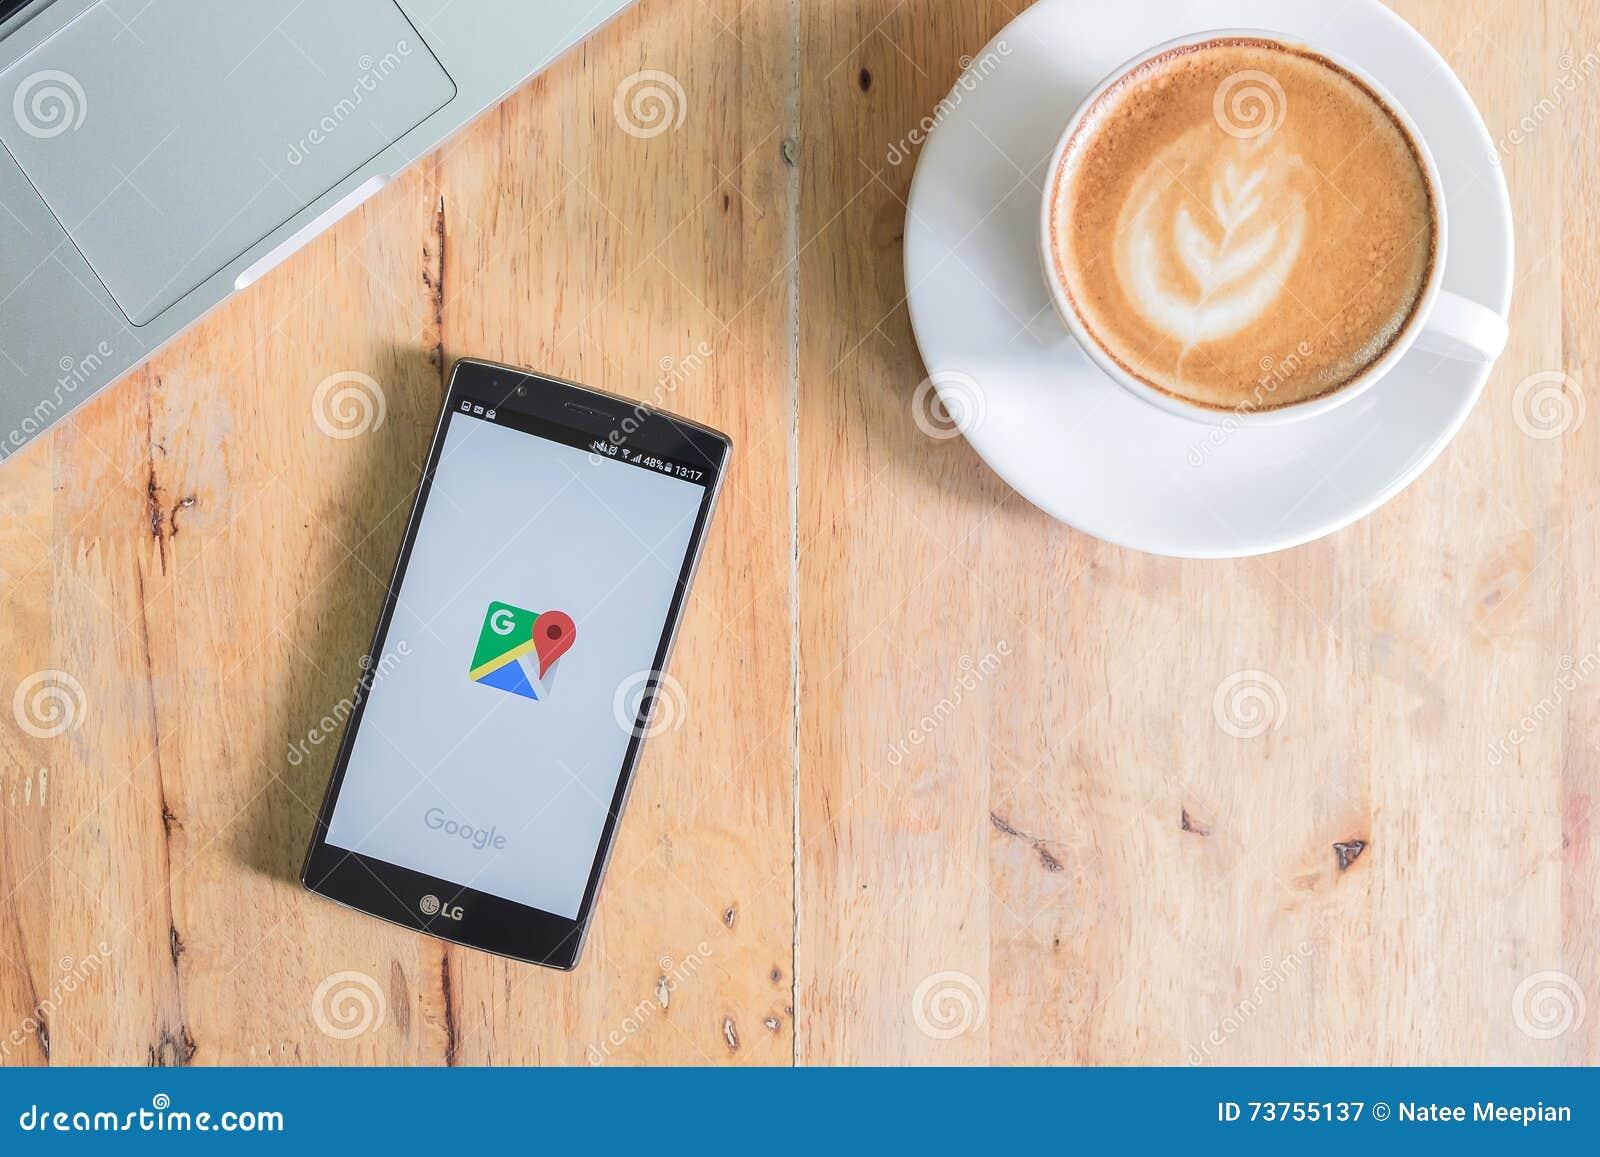 CHIANG MAI, THAILAND - JUN 19, 2016: LG G4 met Google Maps